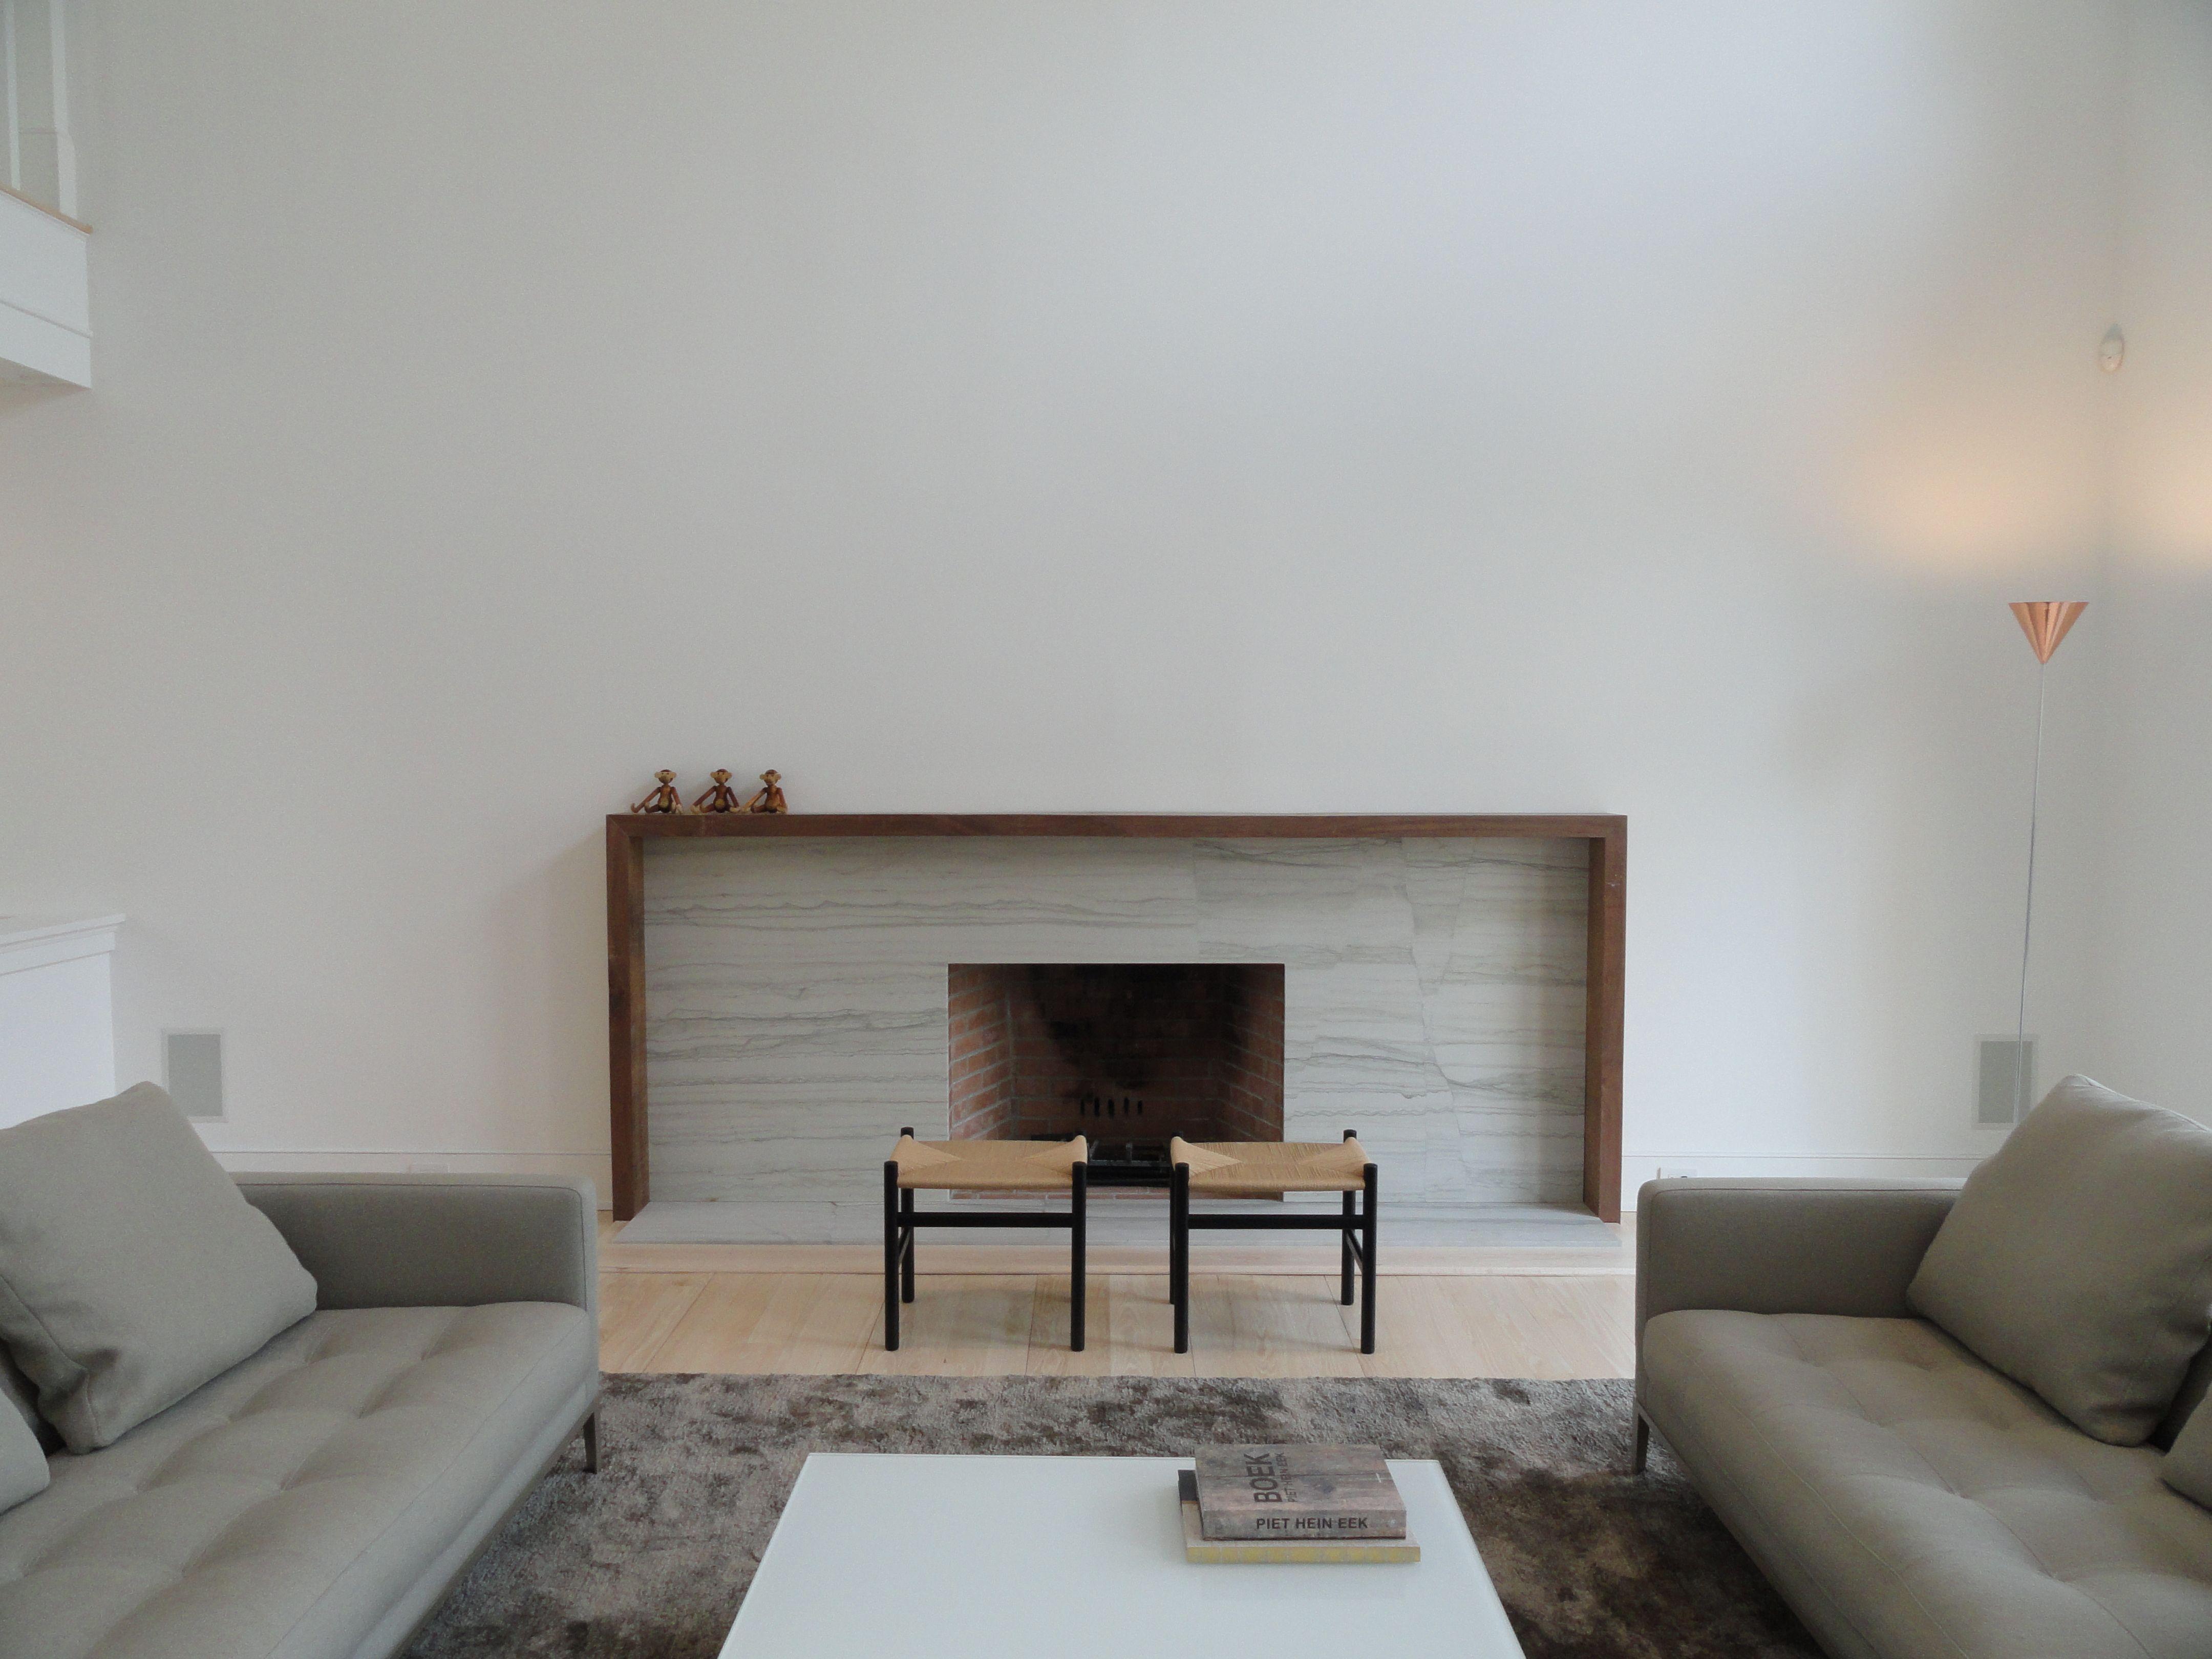 Andy Goldsborough Interior Design / East Hampton Residence